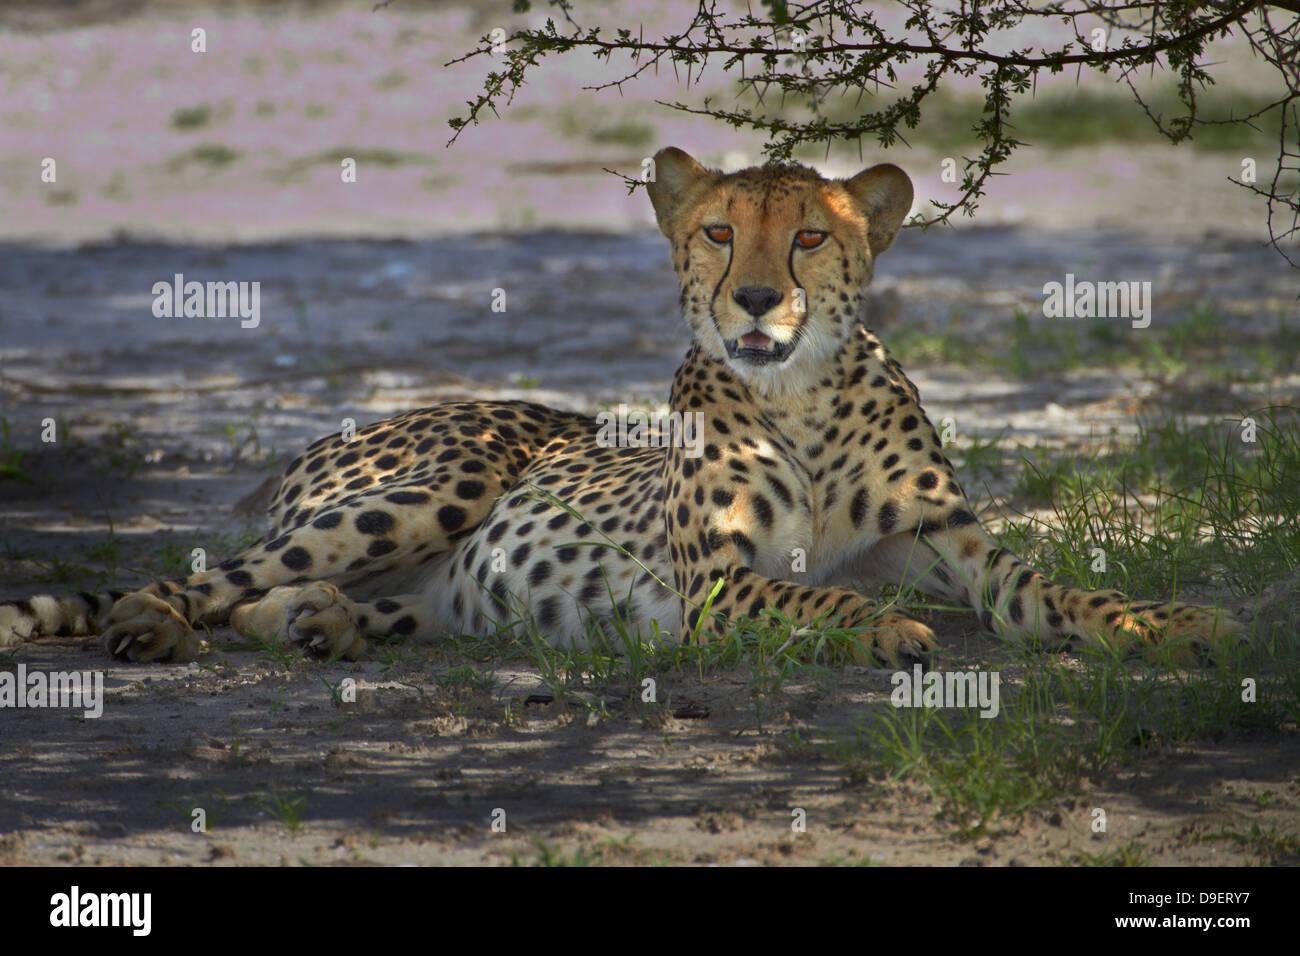 Cheetah (Acinonyx jubatus), Nxai Pan National Park, Botswana, Africa - Stock Image